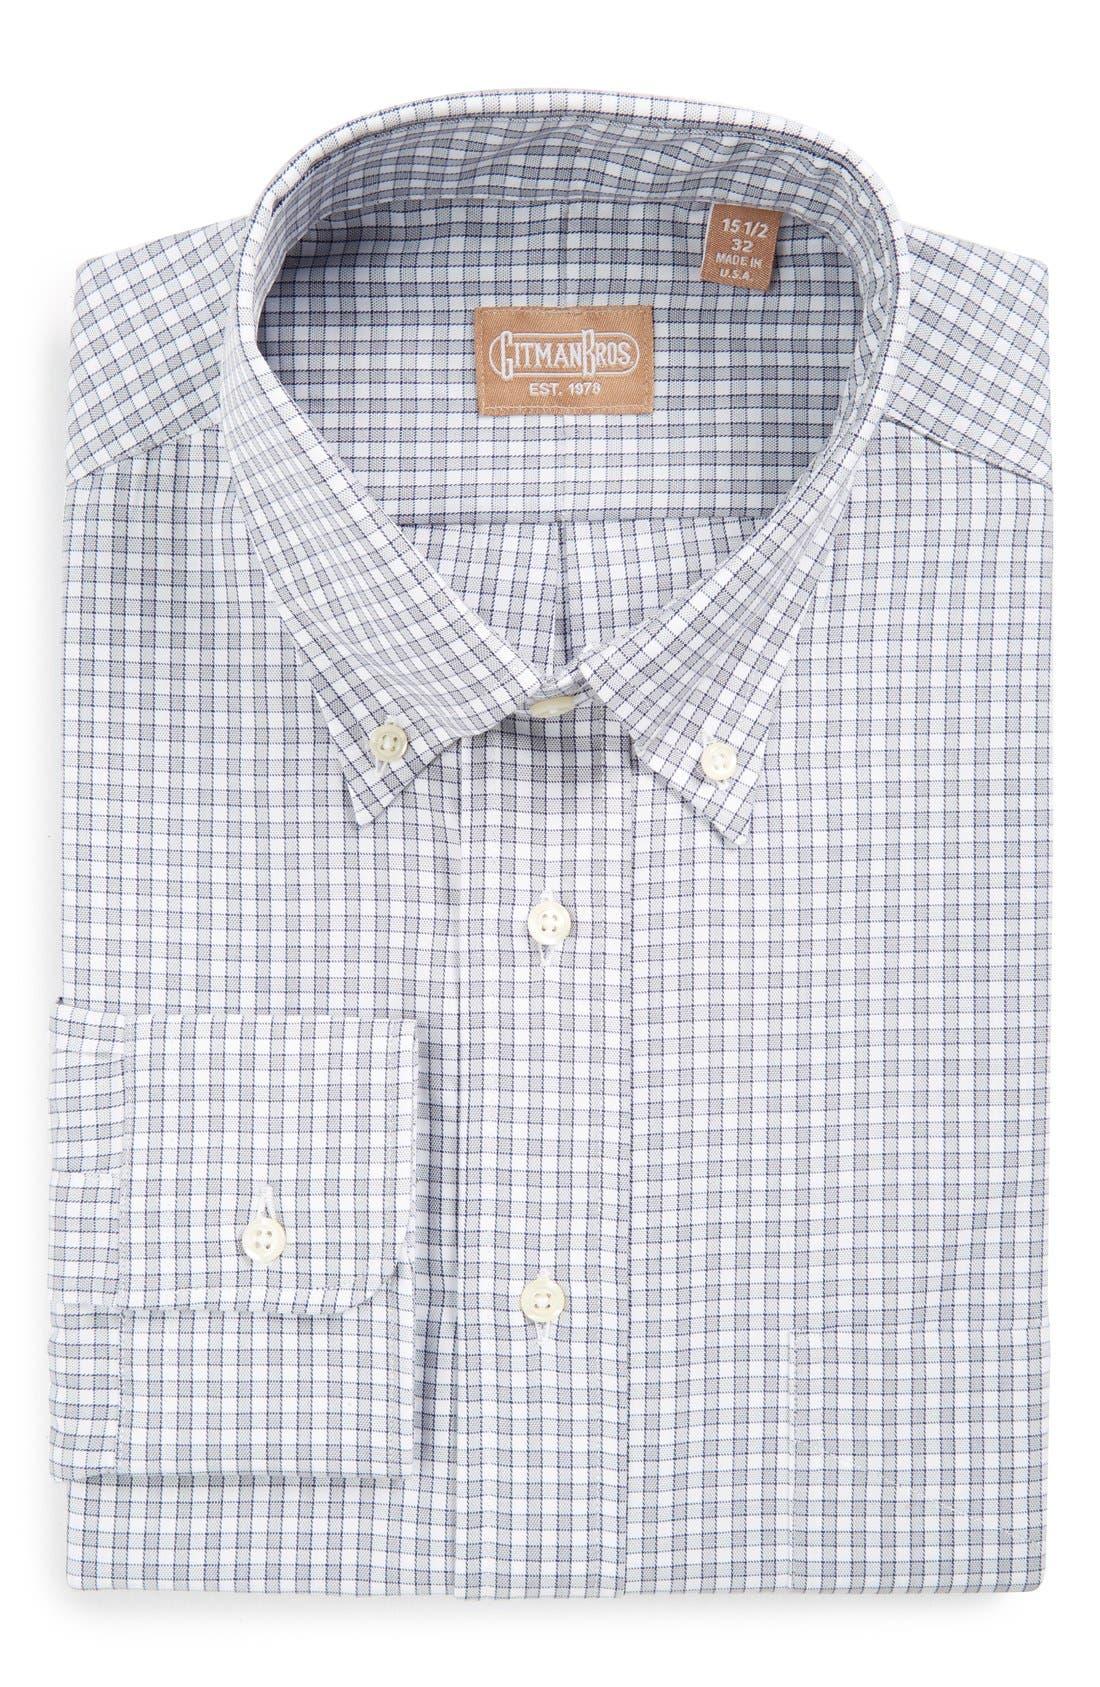 Regular Fit Gingham Check Dress Shirt,                             Main thumbnail 1, color,                             020